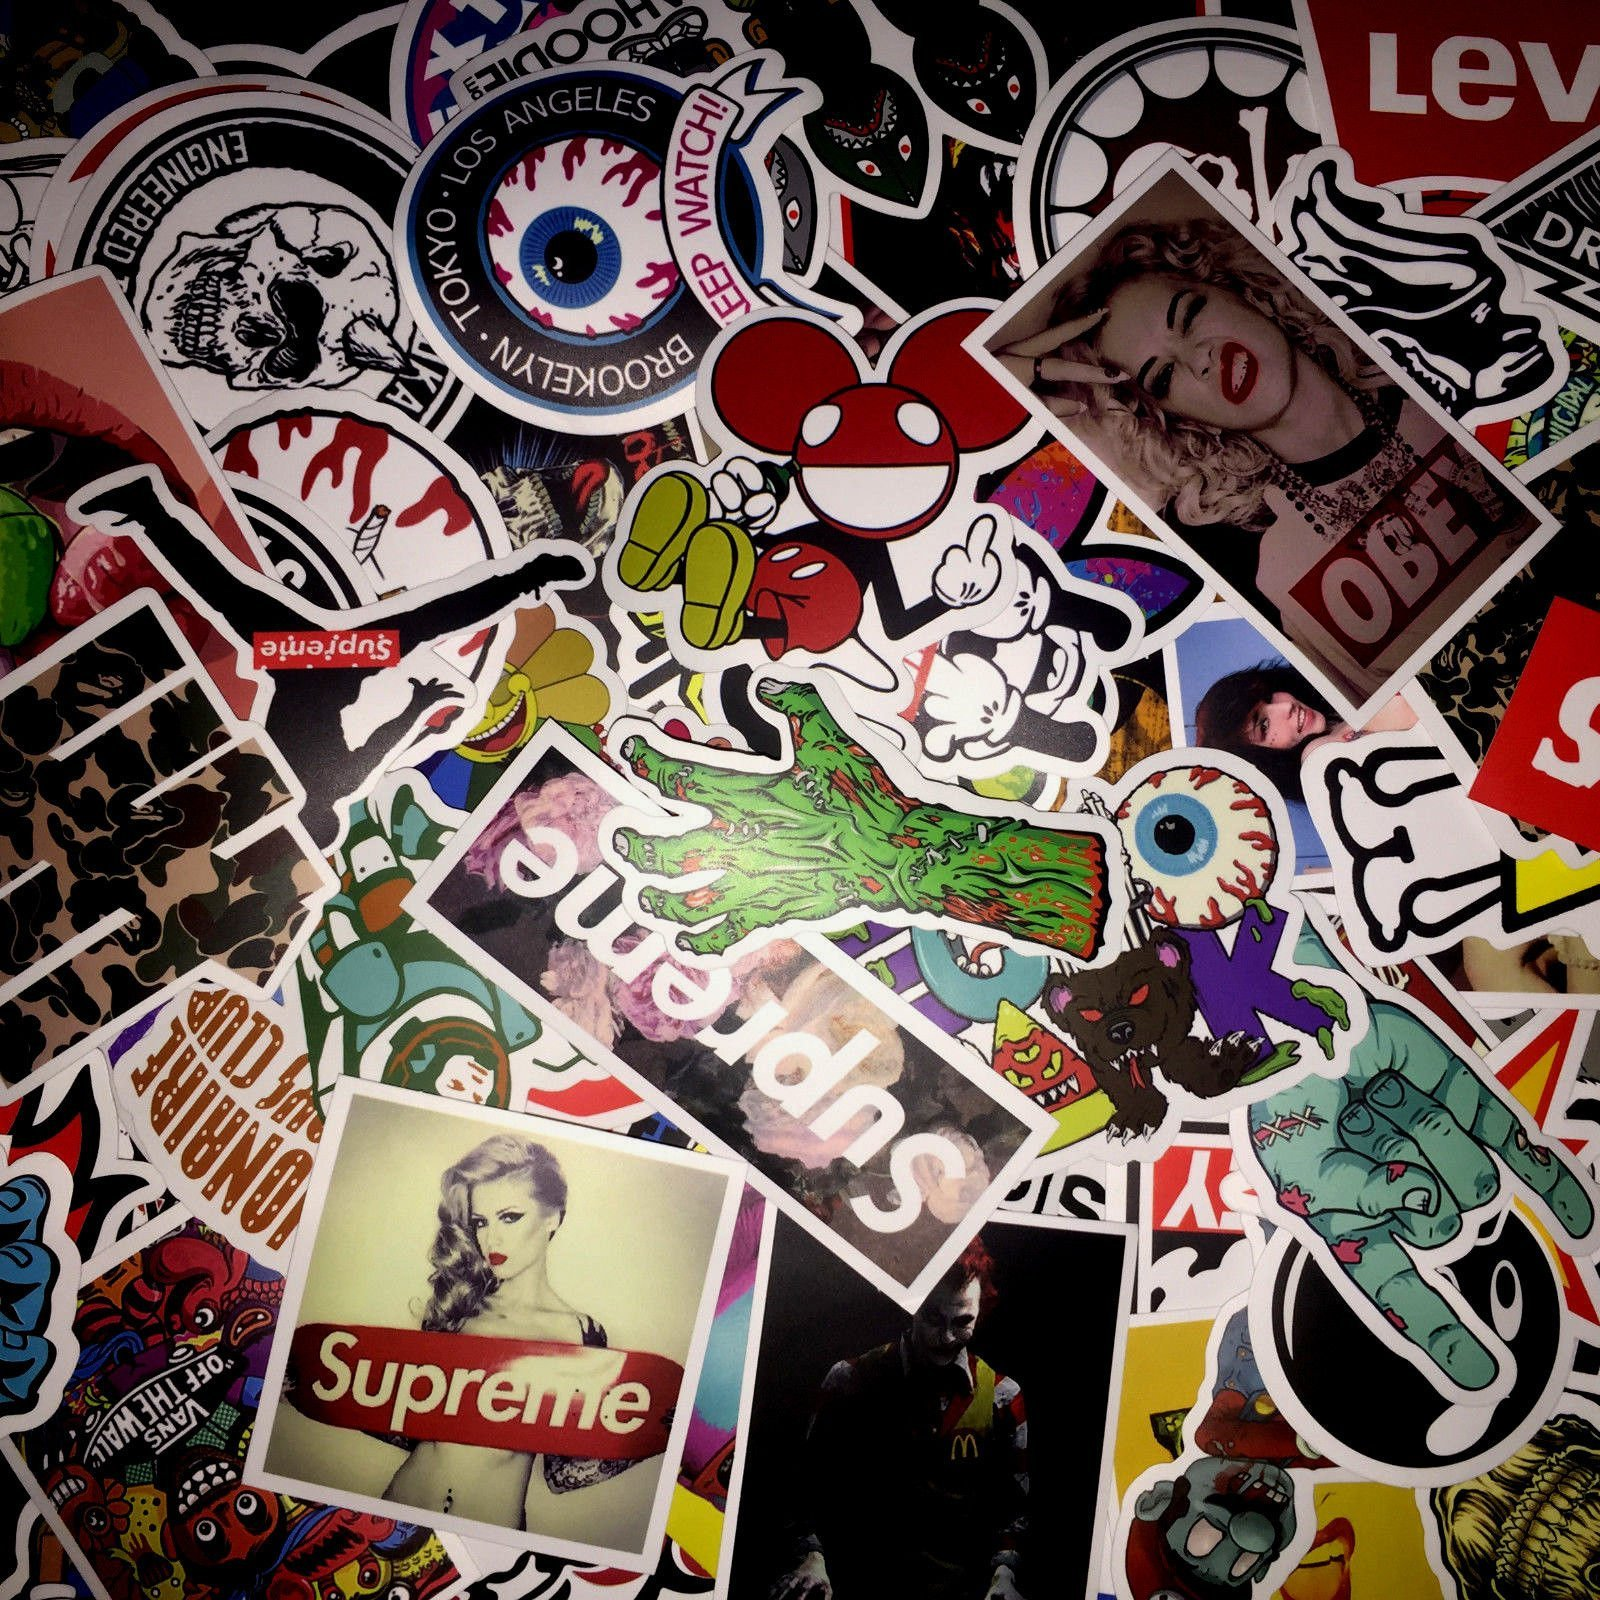 Stickers Calcos 100 un. Surtidos Origen U.S.A. (141Z5QR6)